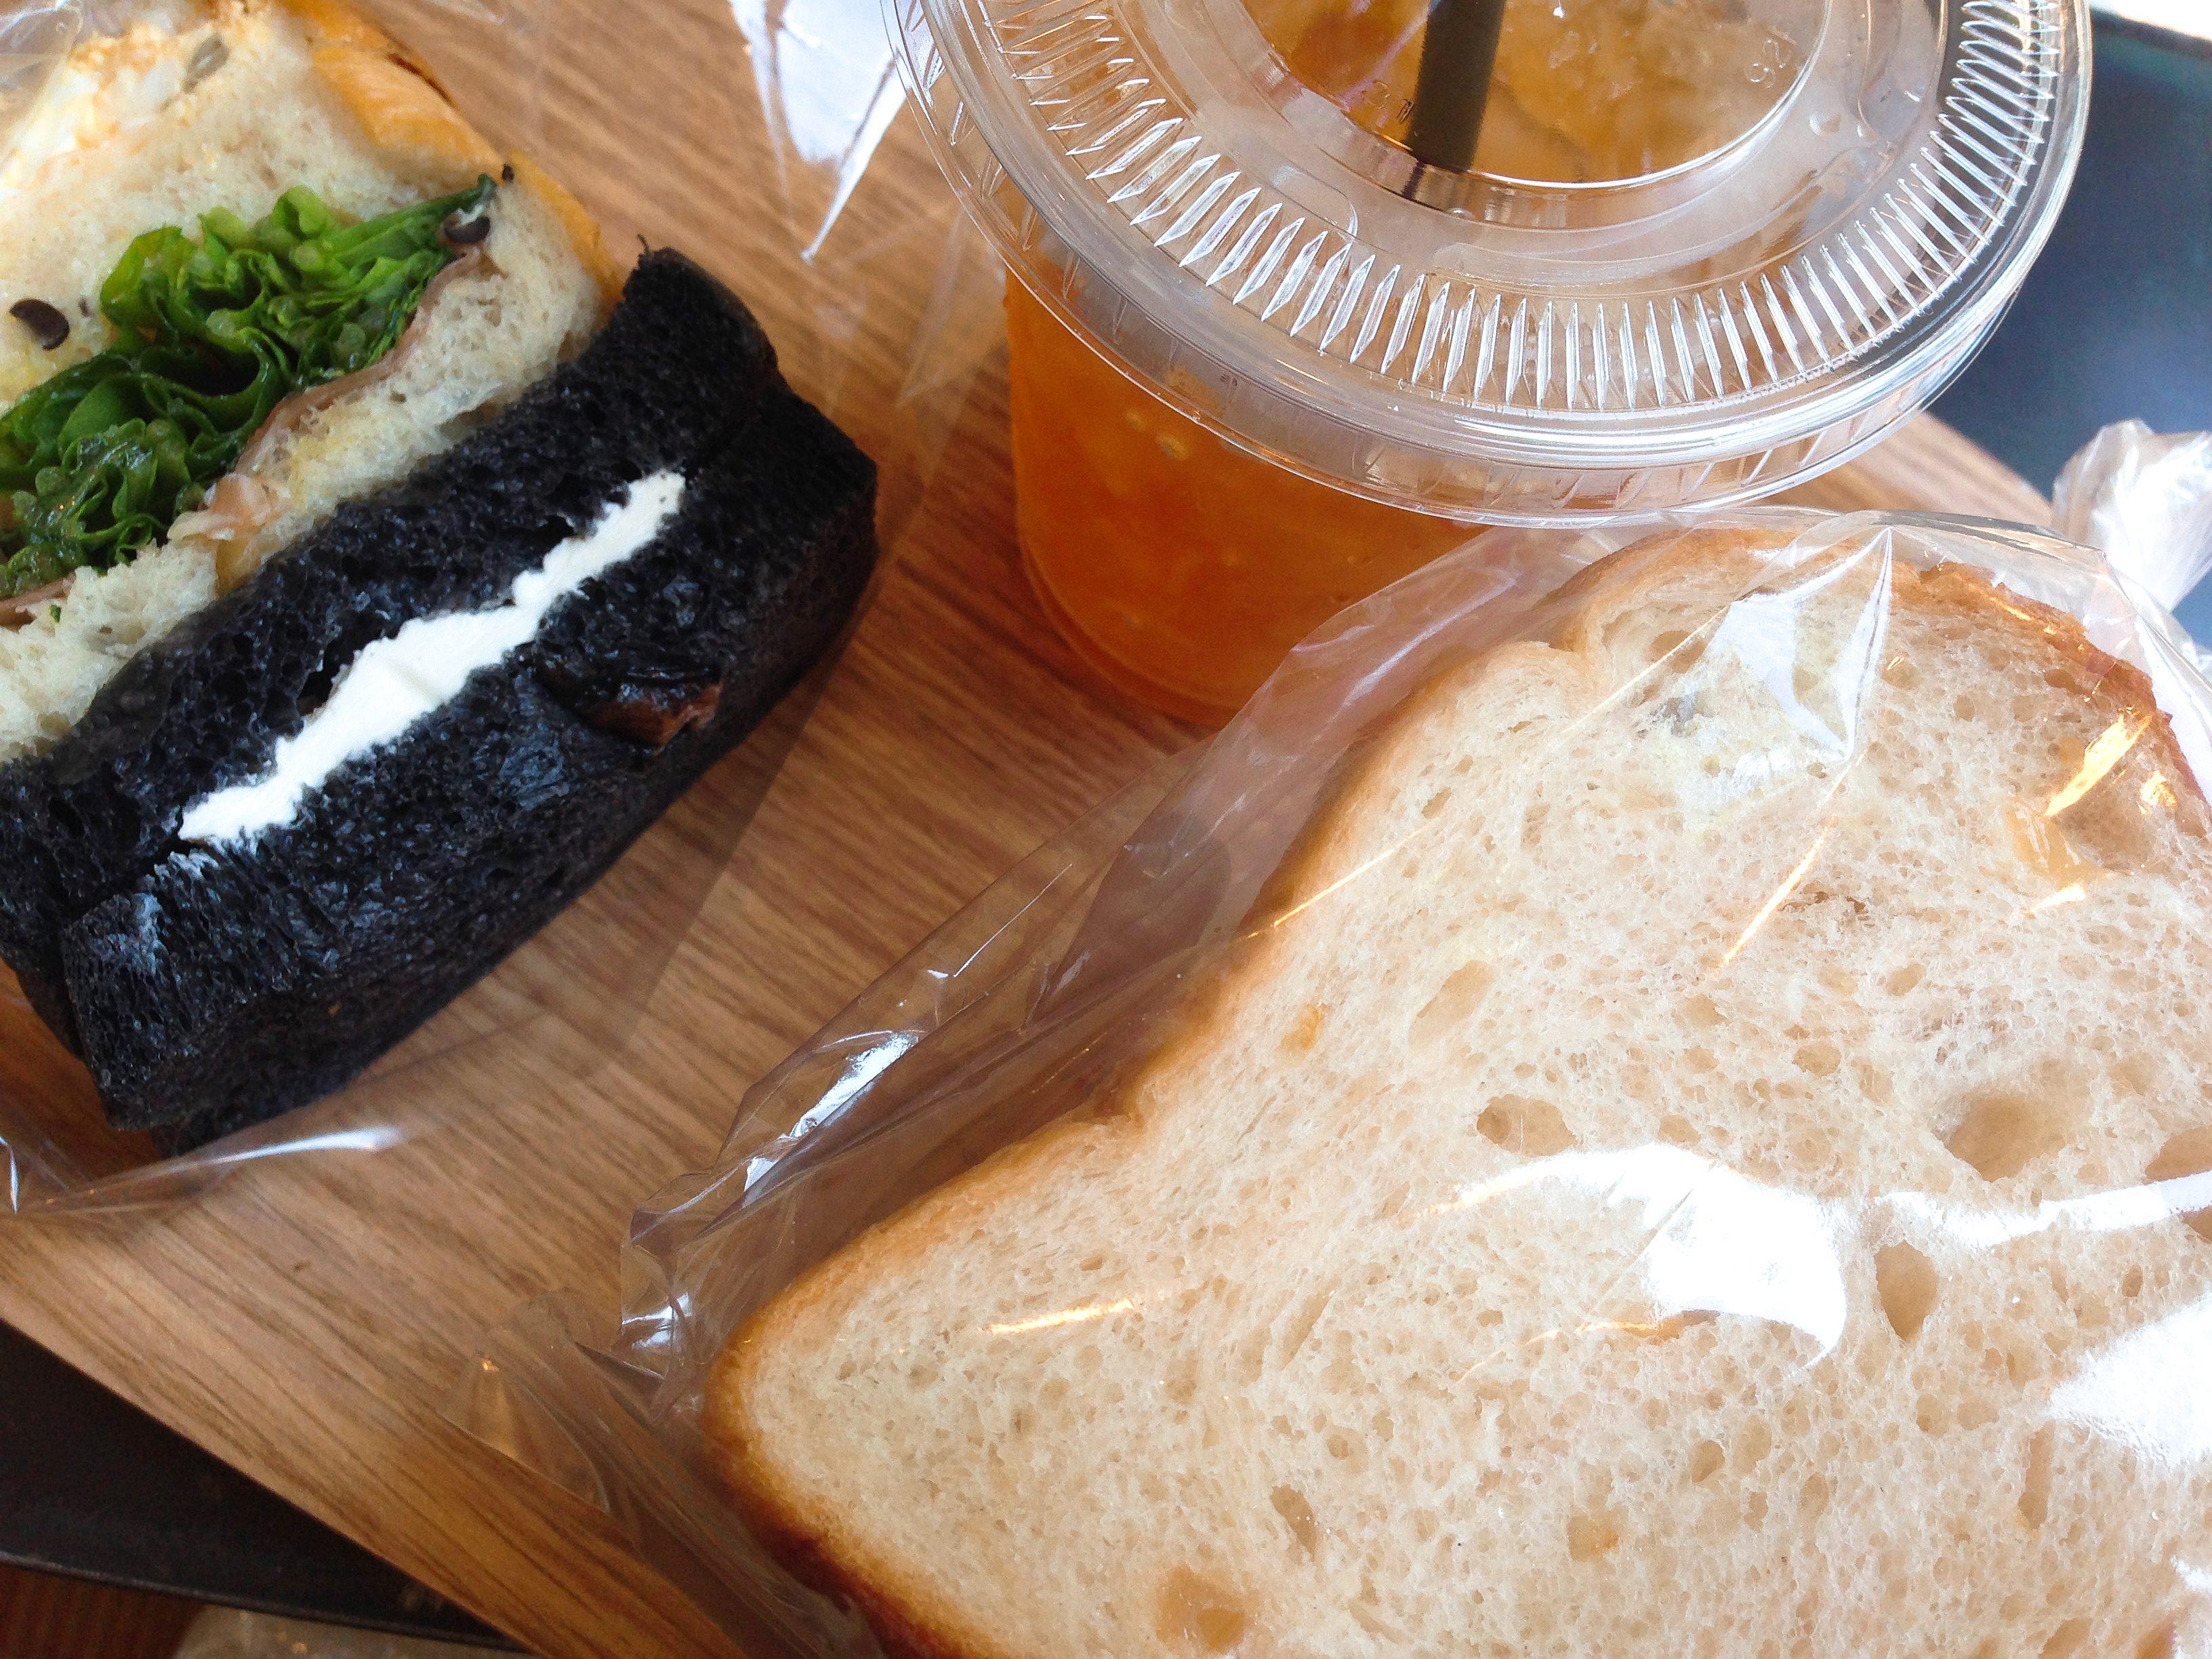 VikingBakeryFのサンドイッチ